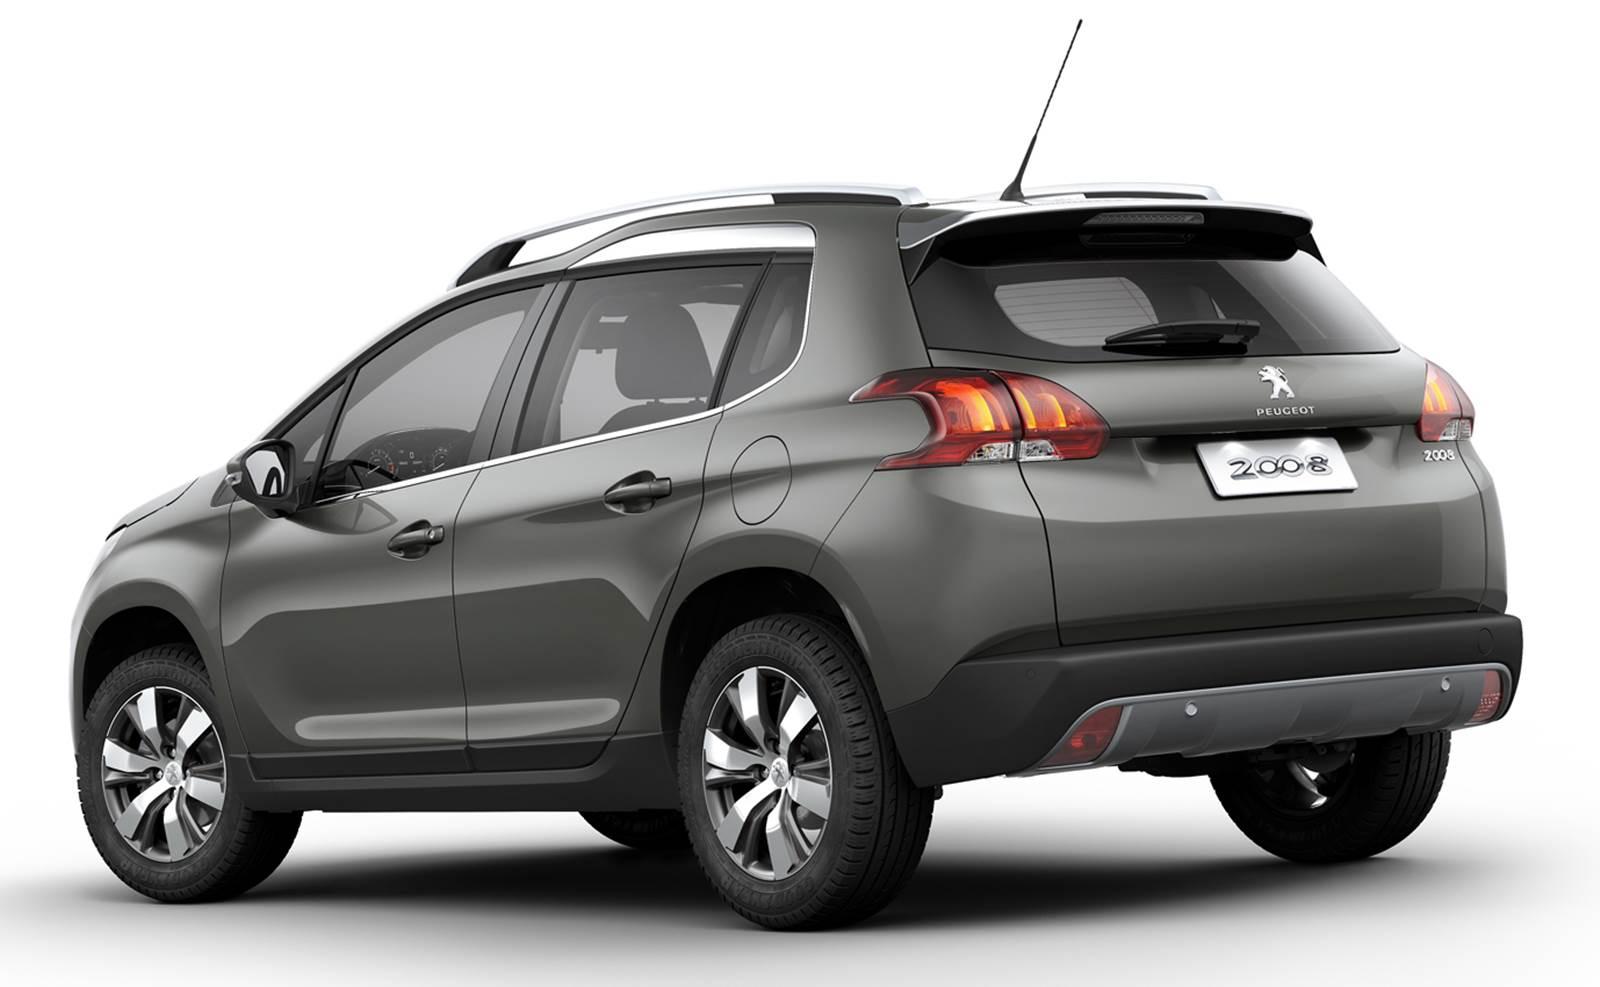 Novo Peugeot 2008 Griffe 1.6 Automático